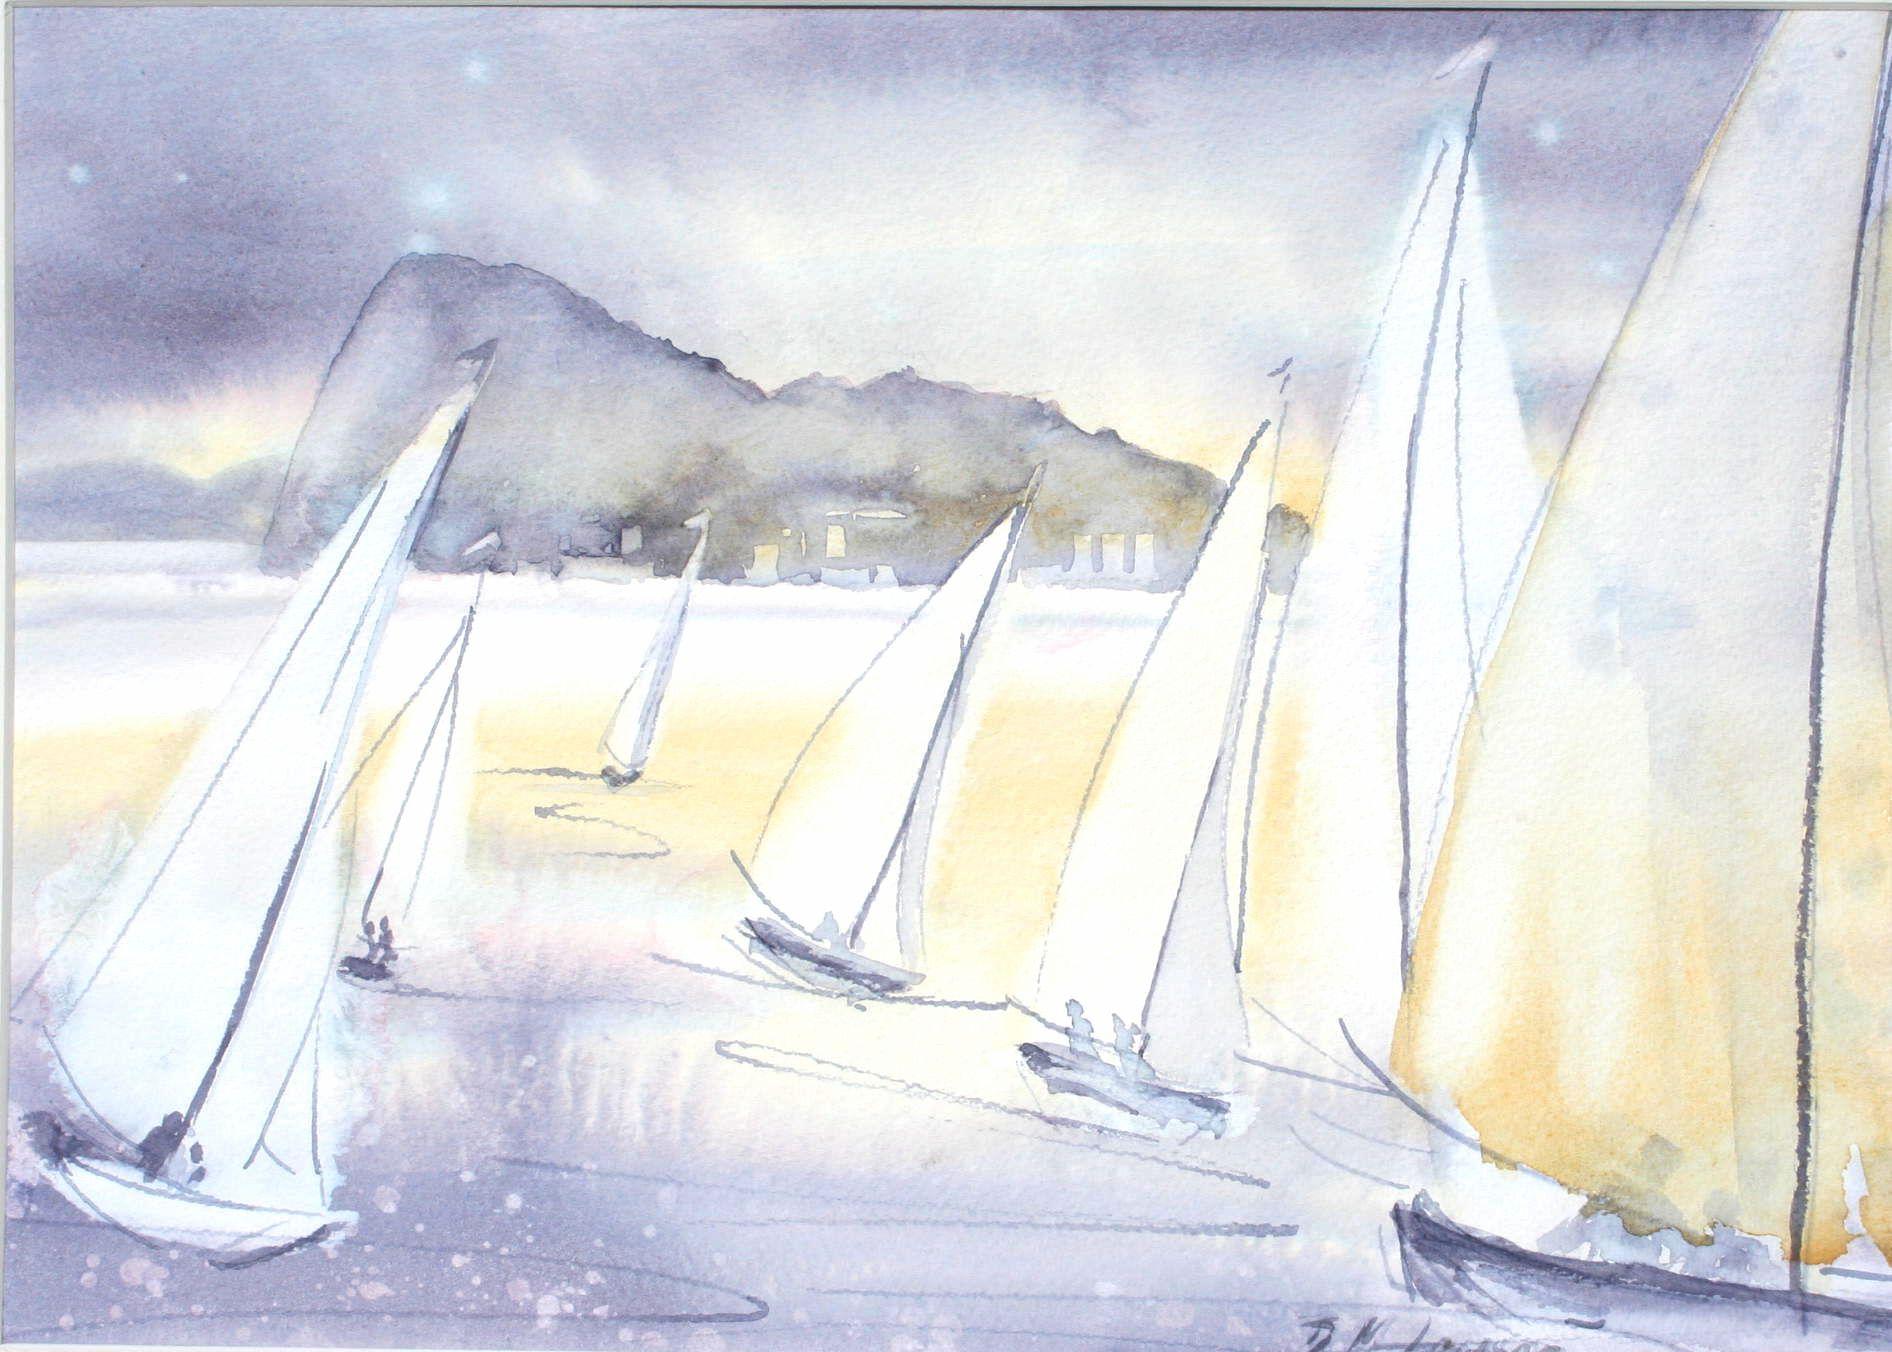 Gibraltar Regattas No 2 - 38cm x 27cm